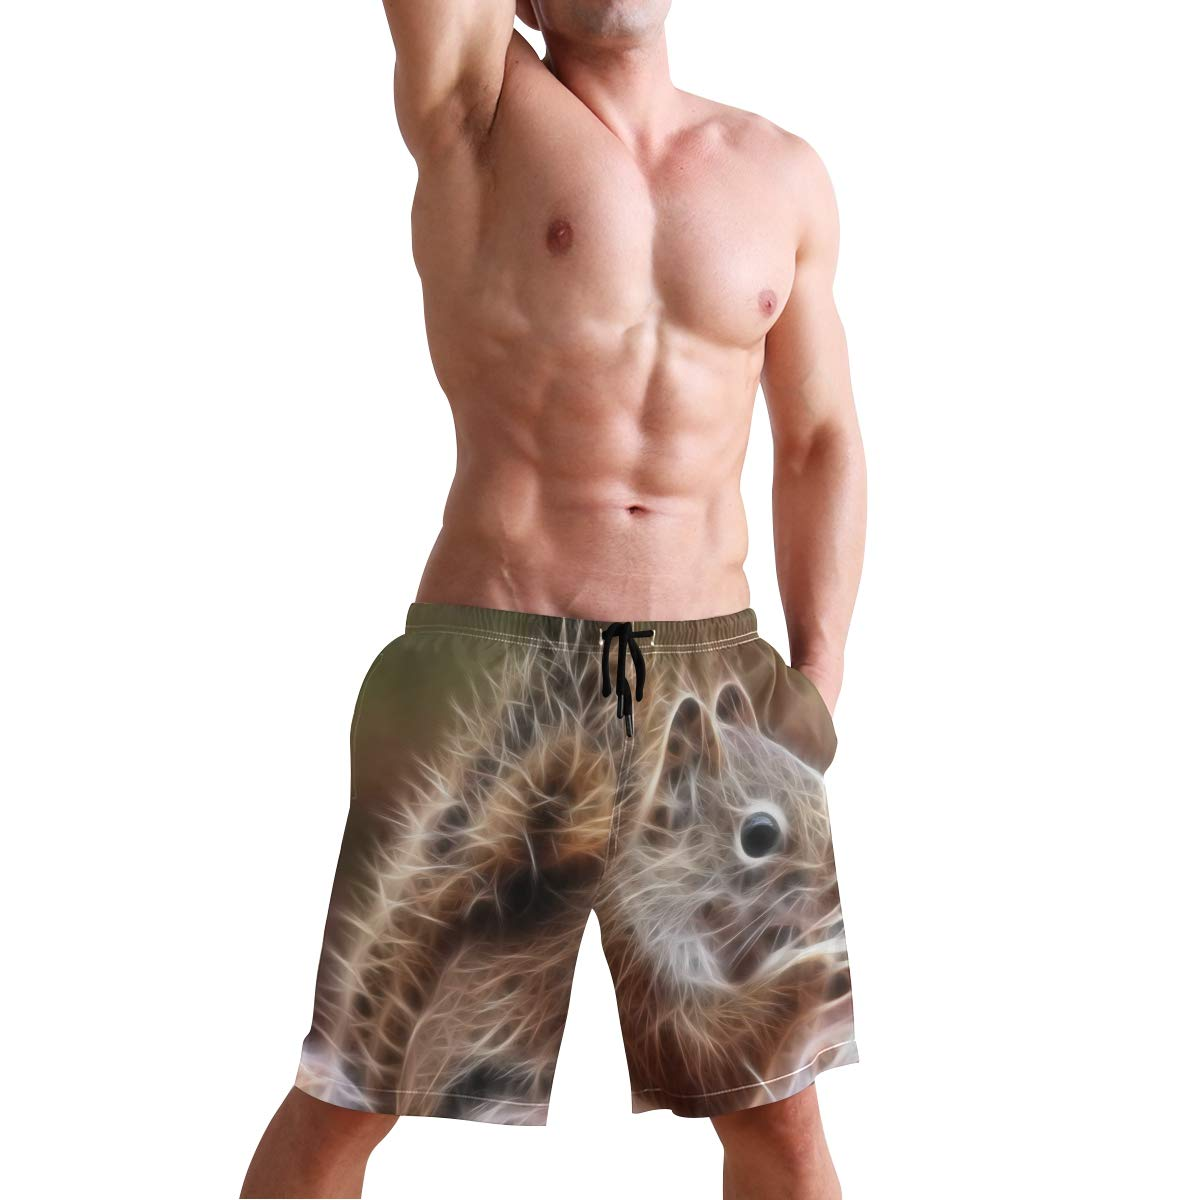 KVMV Squirrels Chipmunks Fractal Quick Dry Beach Shorts